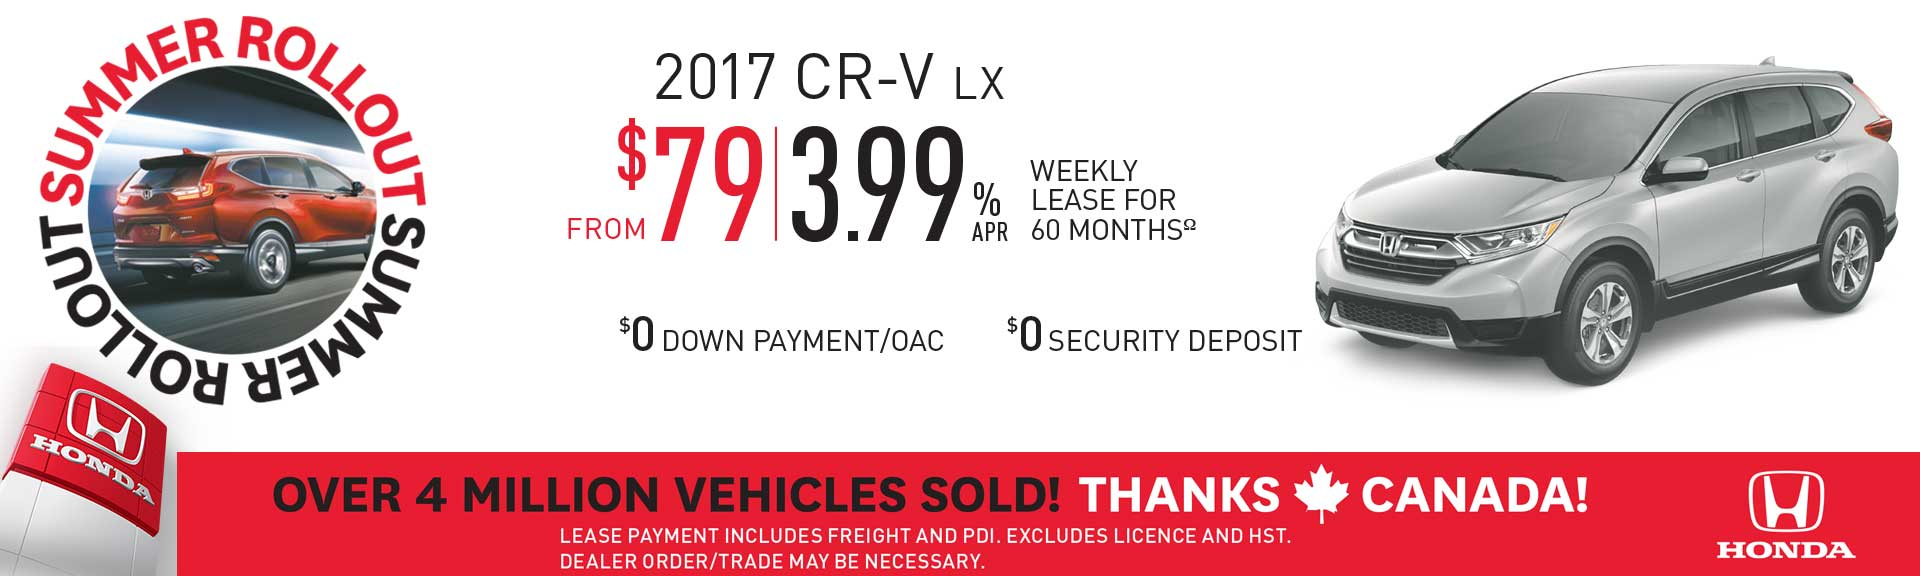 2017 CR-V LX